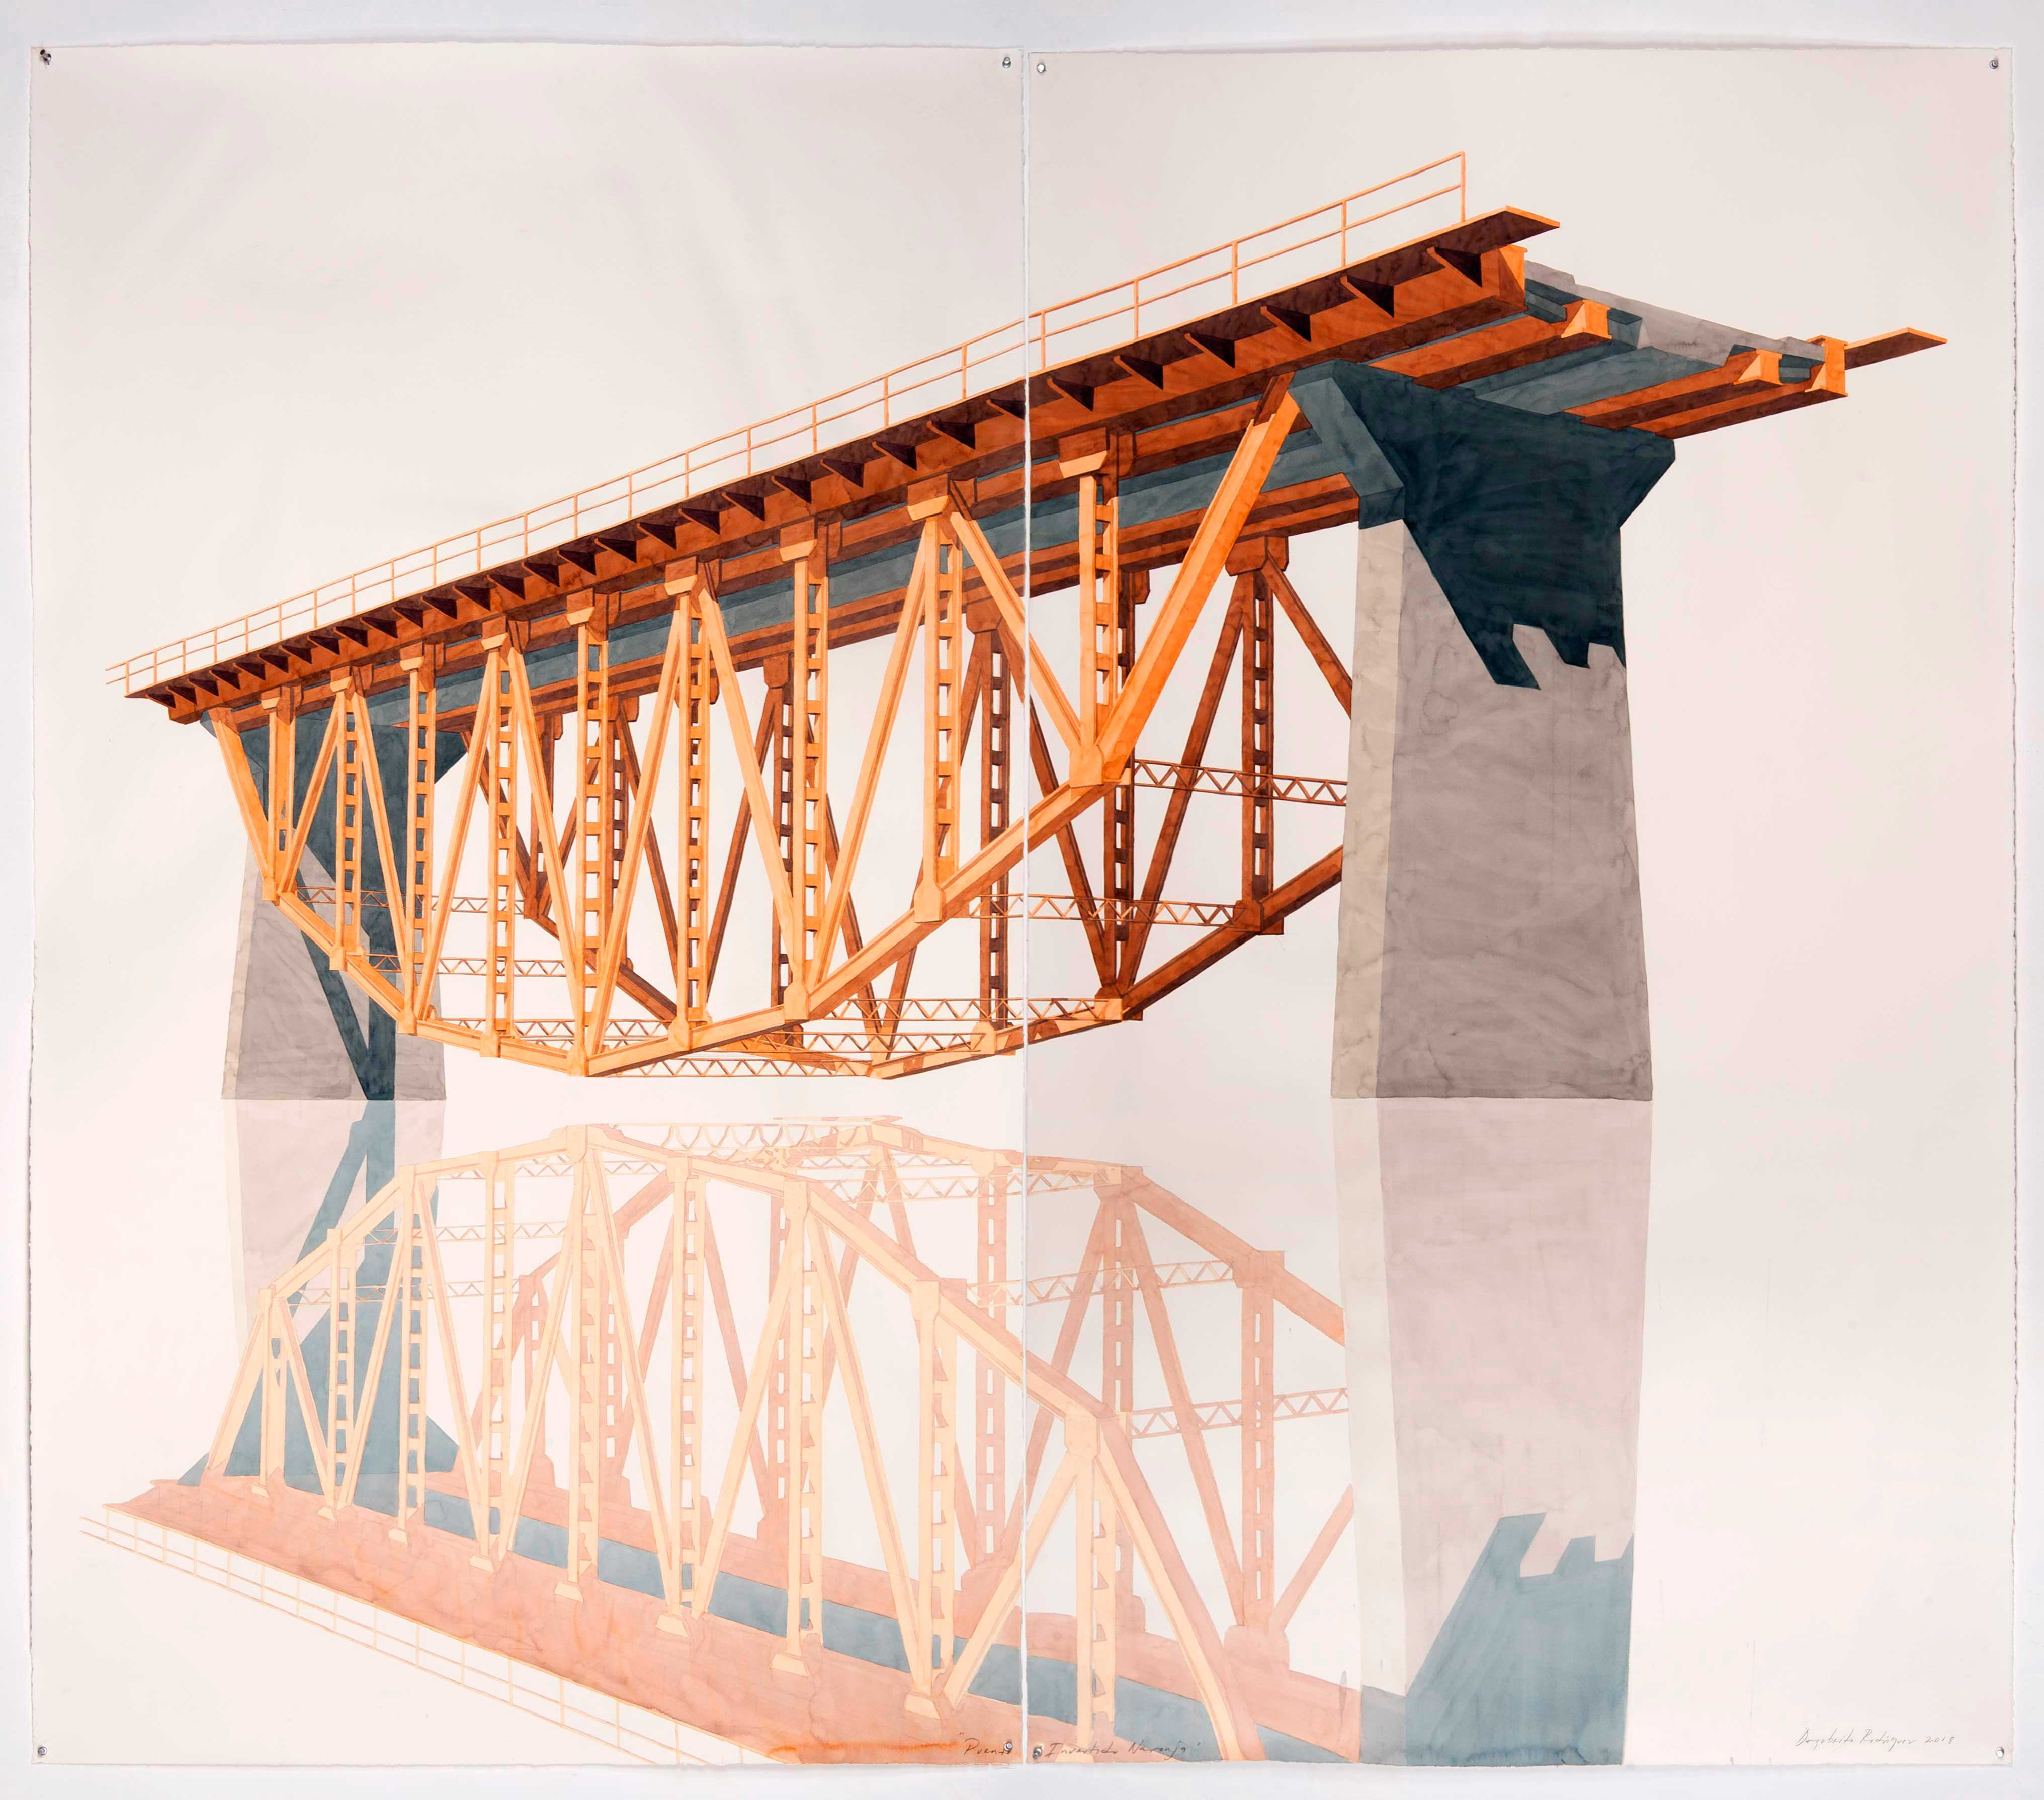 Puente Invertido Naranja